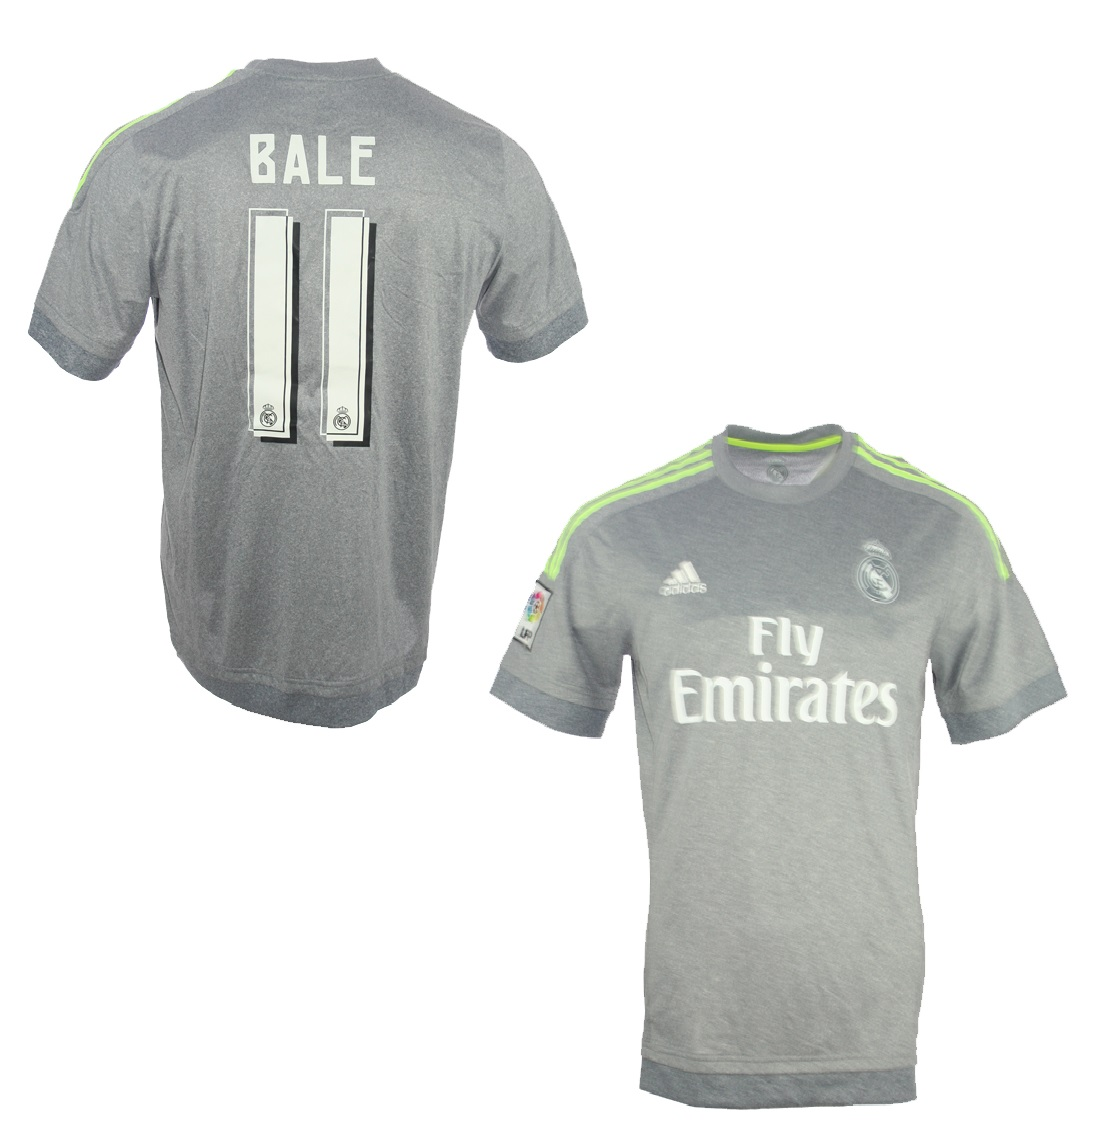 Adidas Real Madrid Trikot 11 Gareth Bale 201516 Away Grau